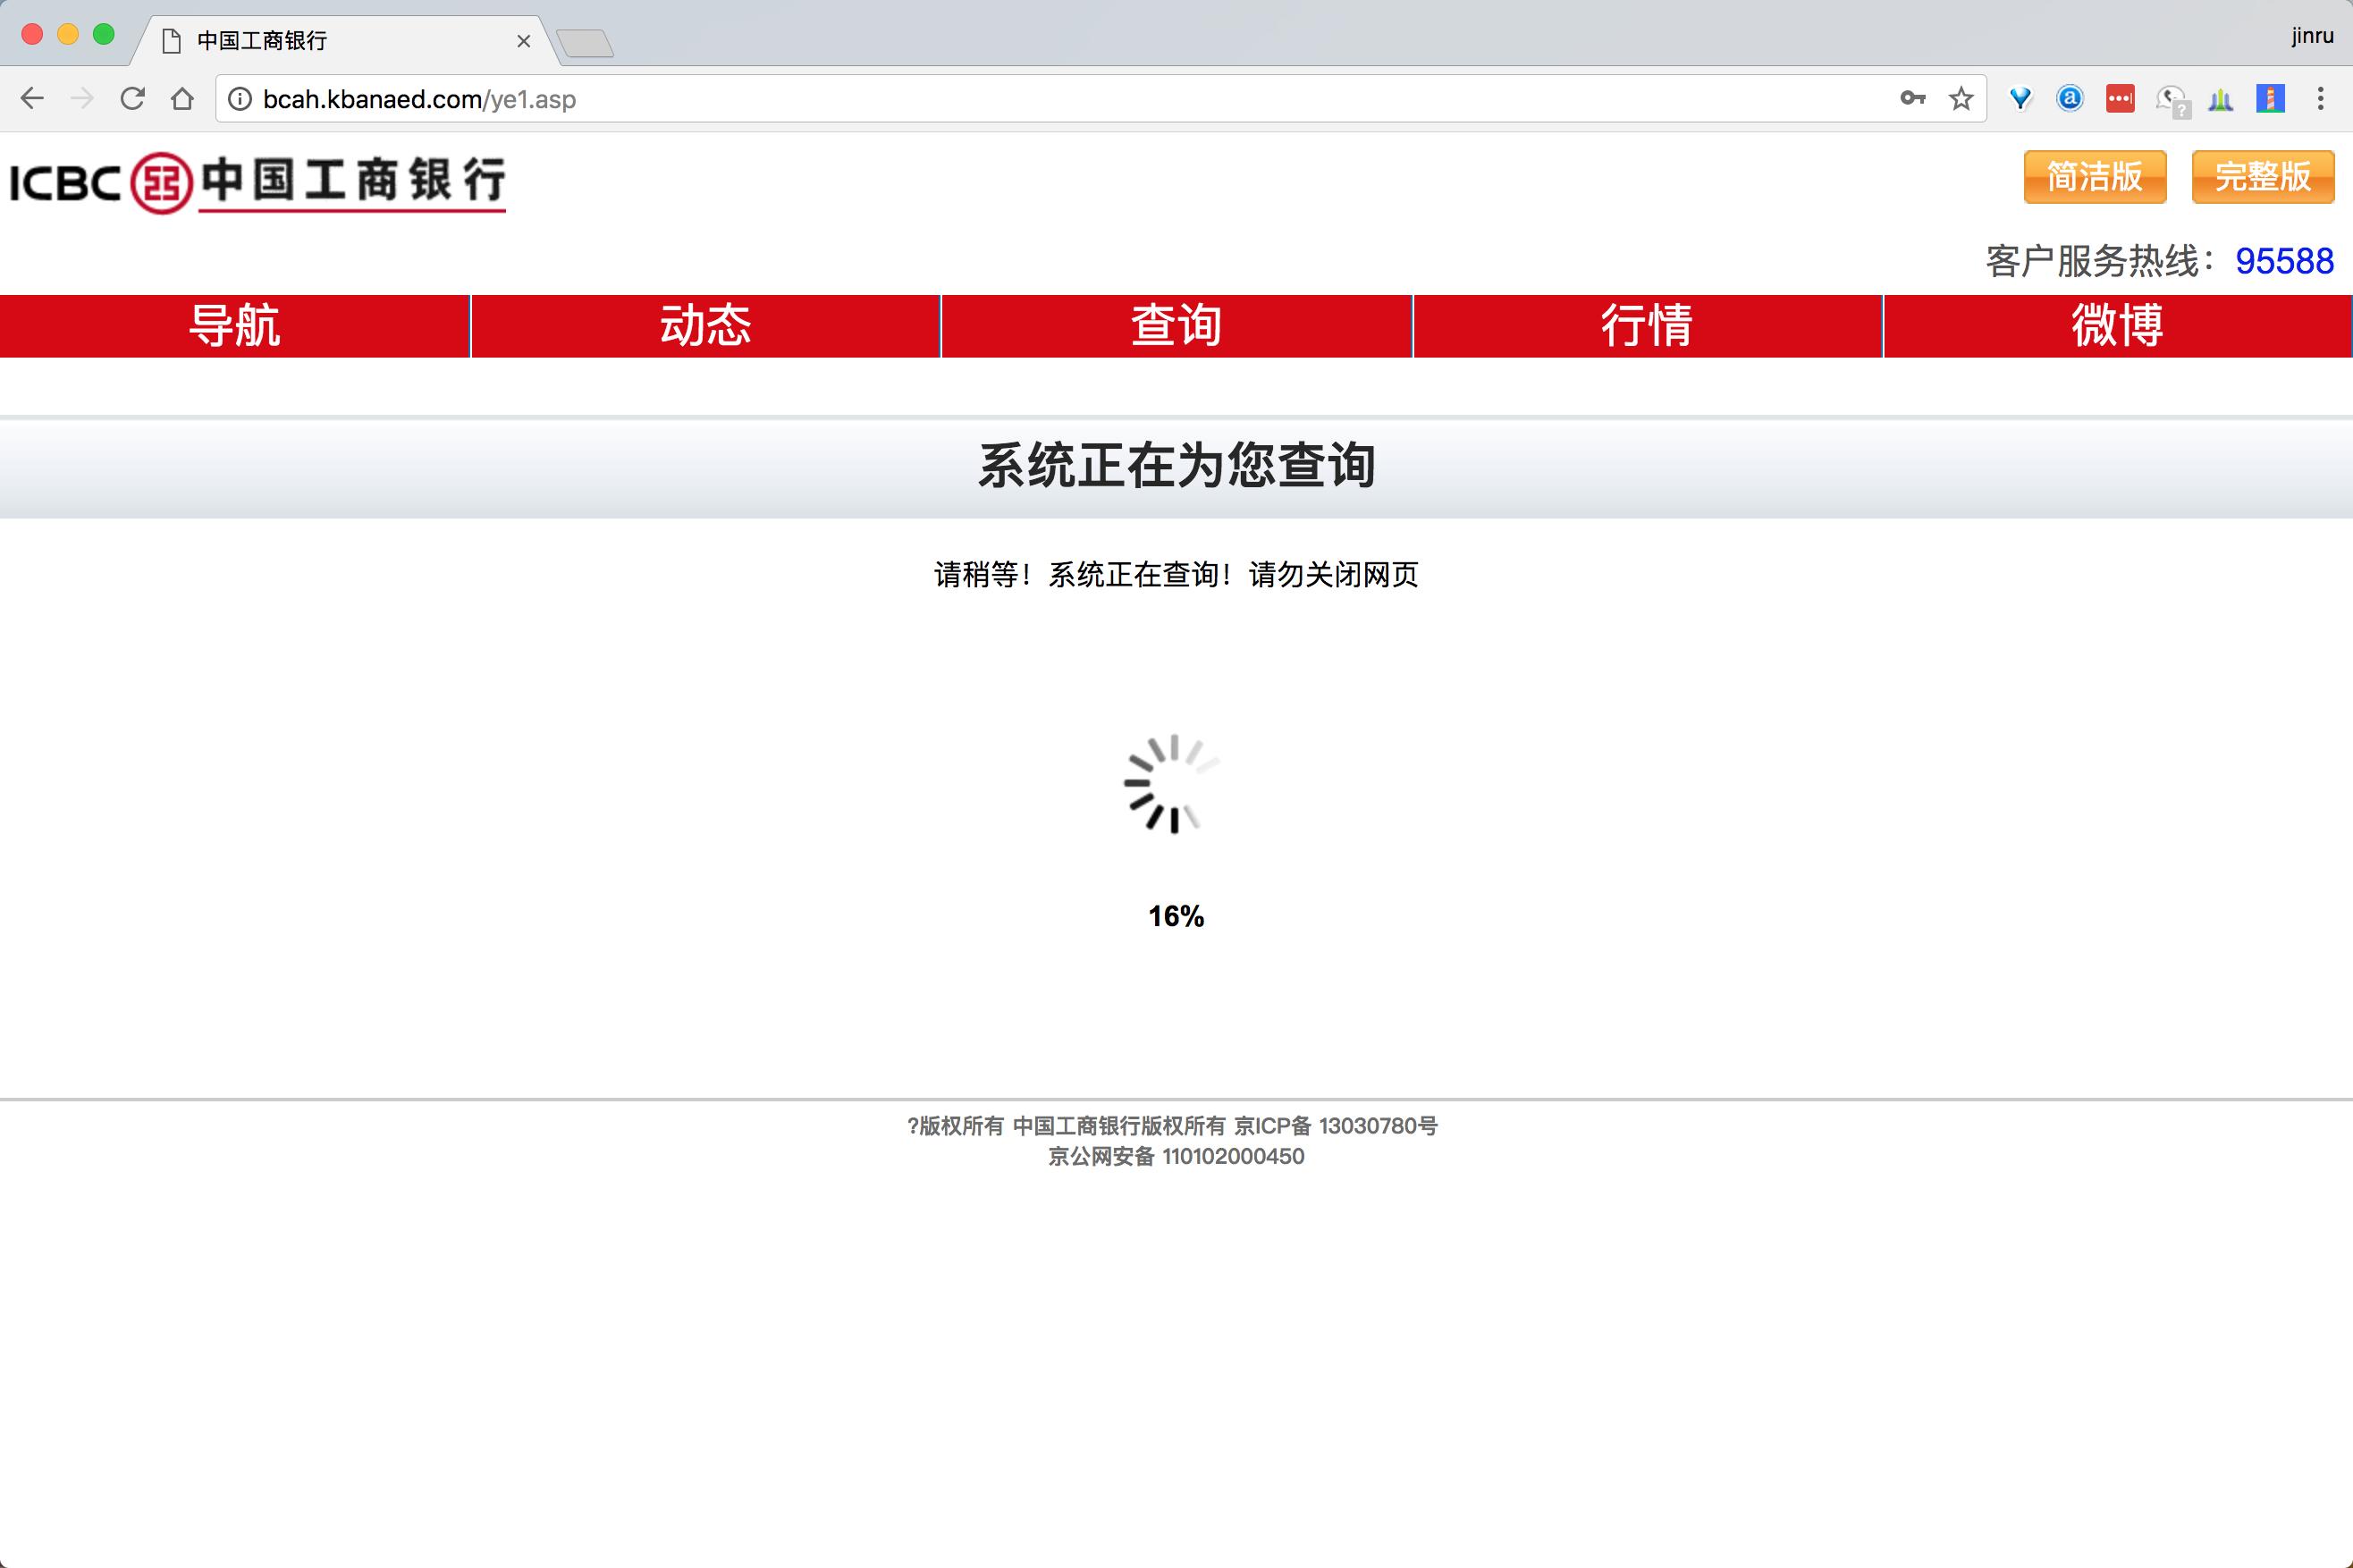 http://bcah.kbanaed.com/ 神奇的工商银行 换网址了。。